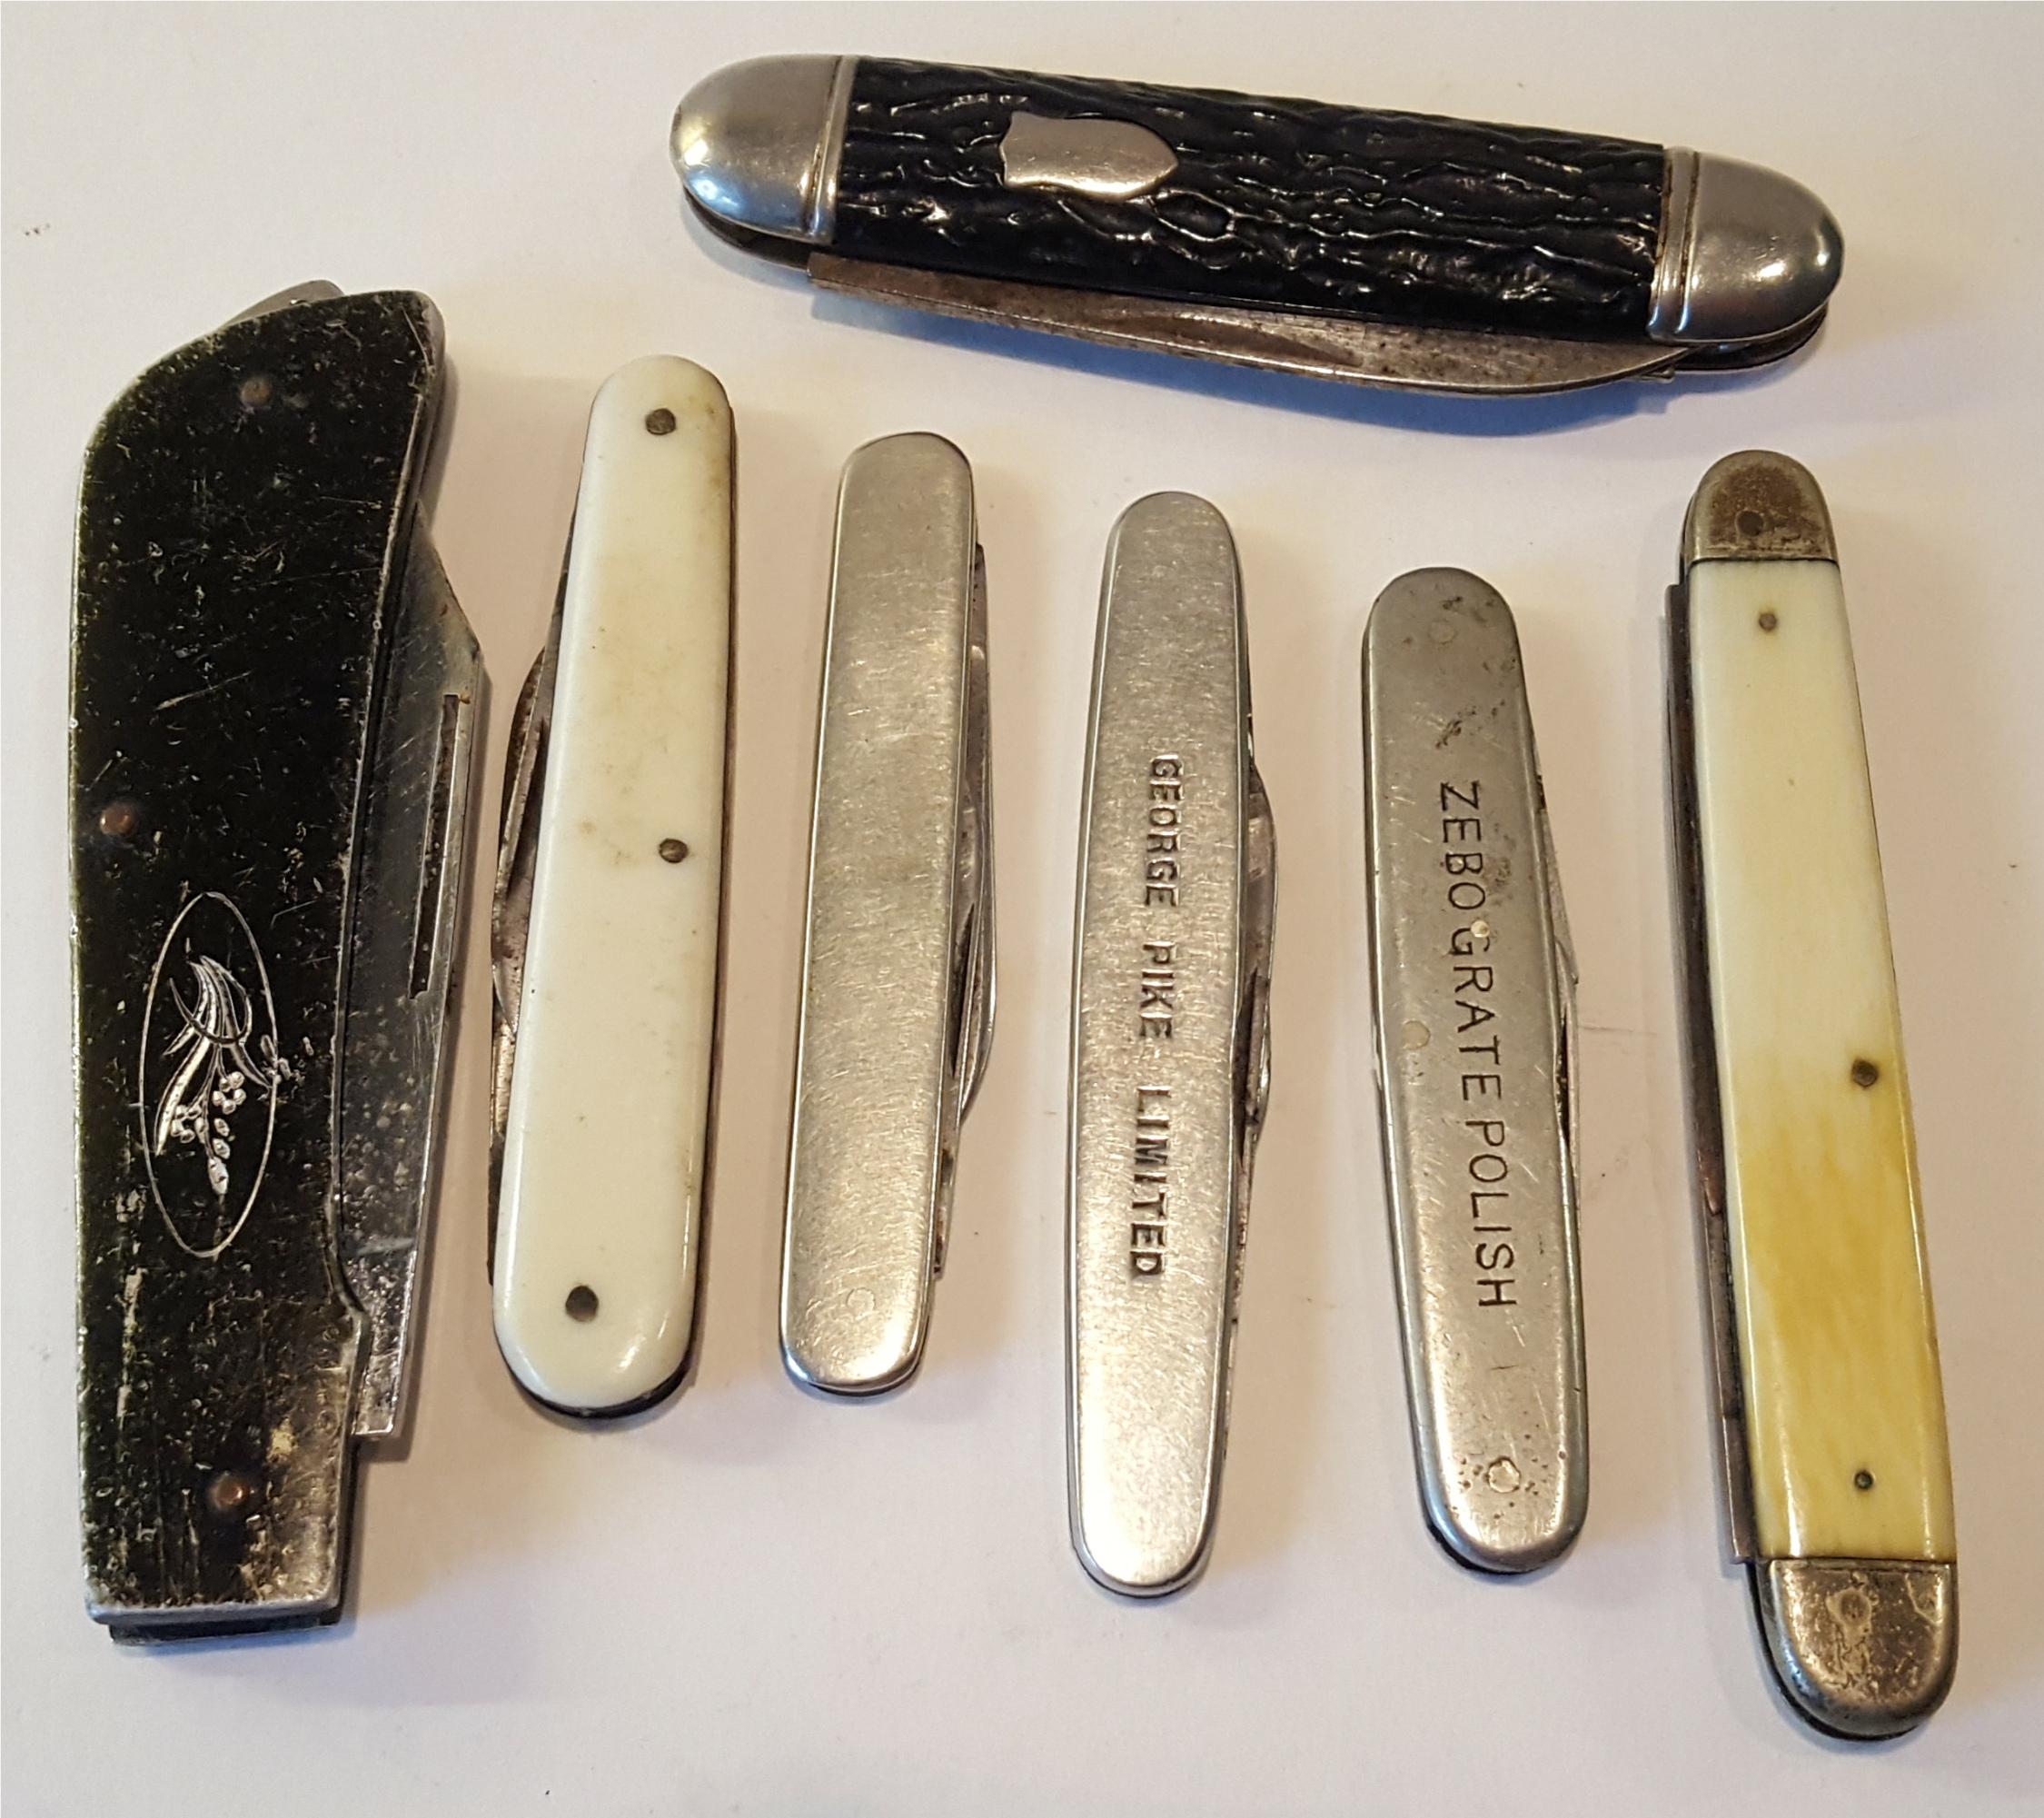 Lot 97 - Vintage Parcel of 7 Pen Knives Includes bone Handles Sheffield Blades & Advertising